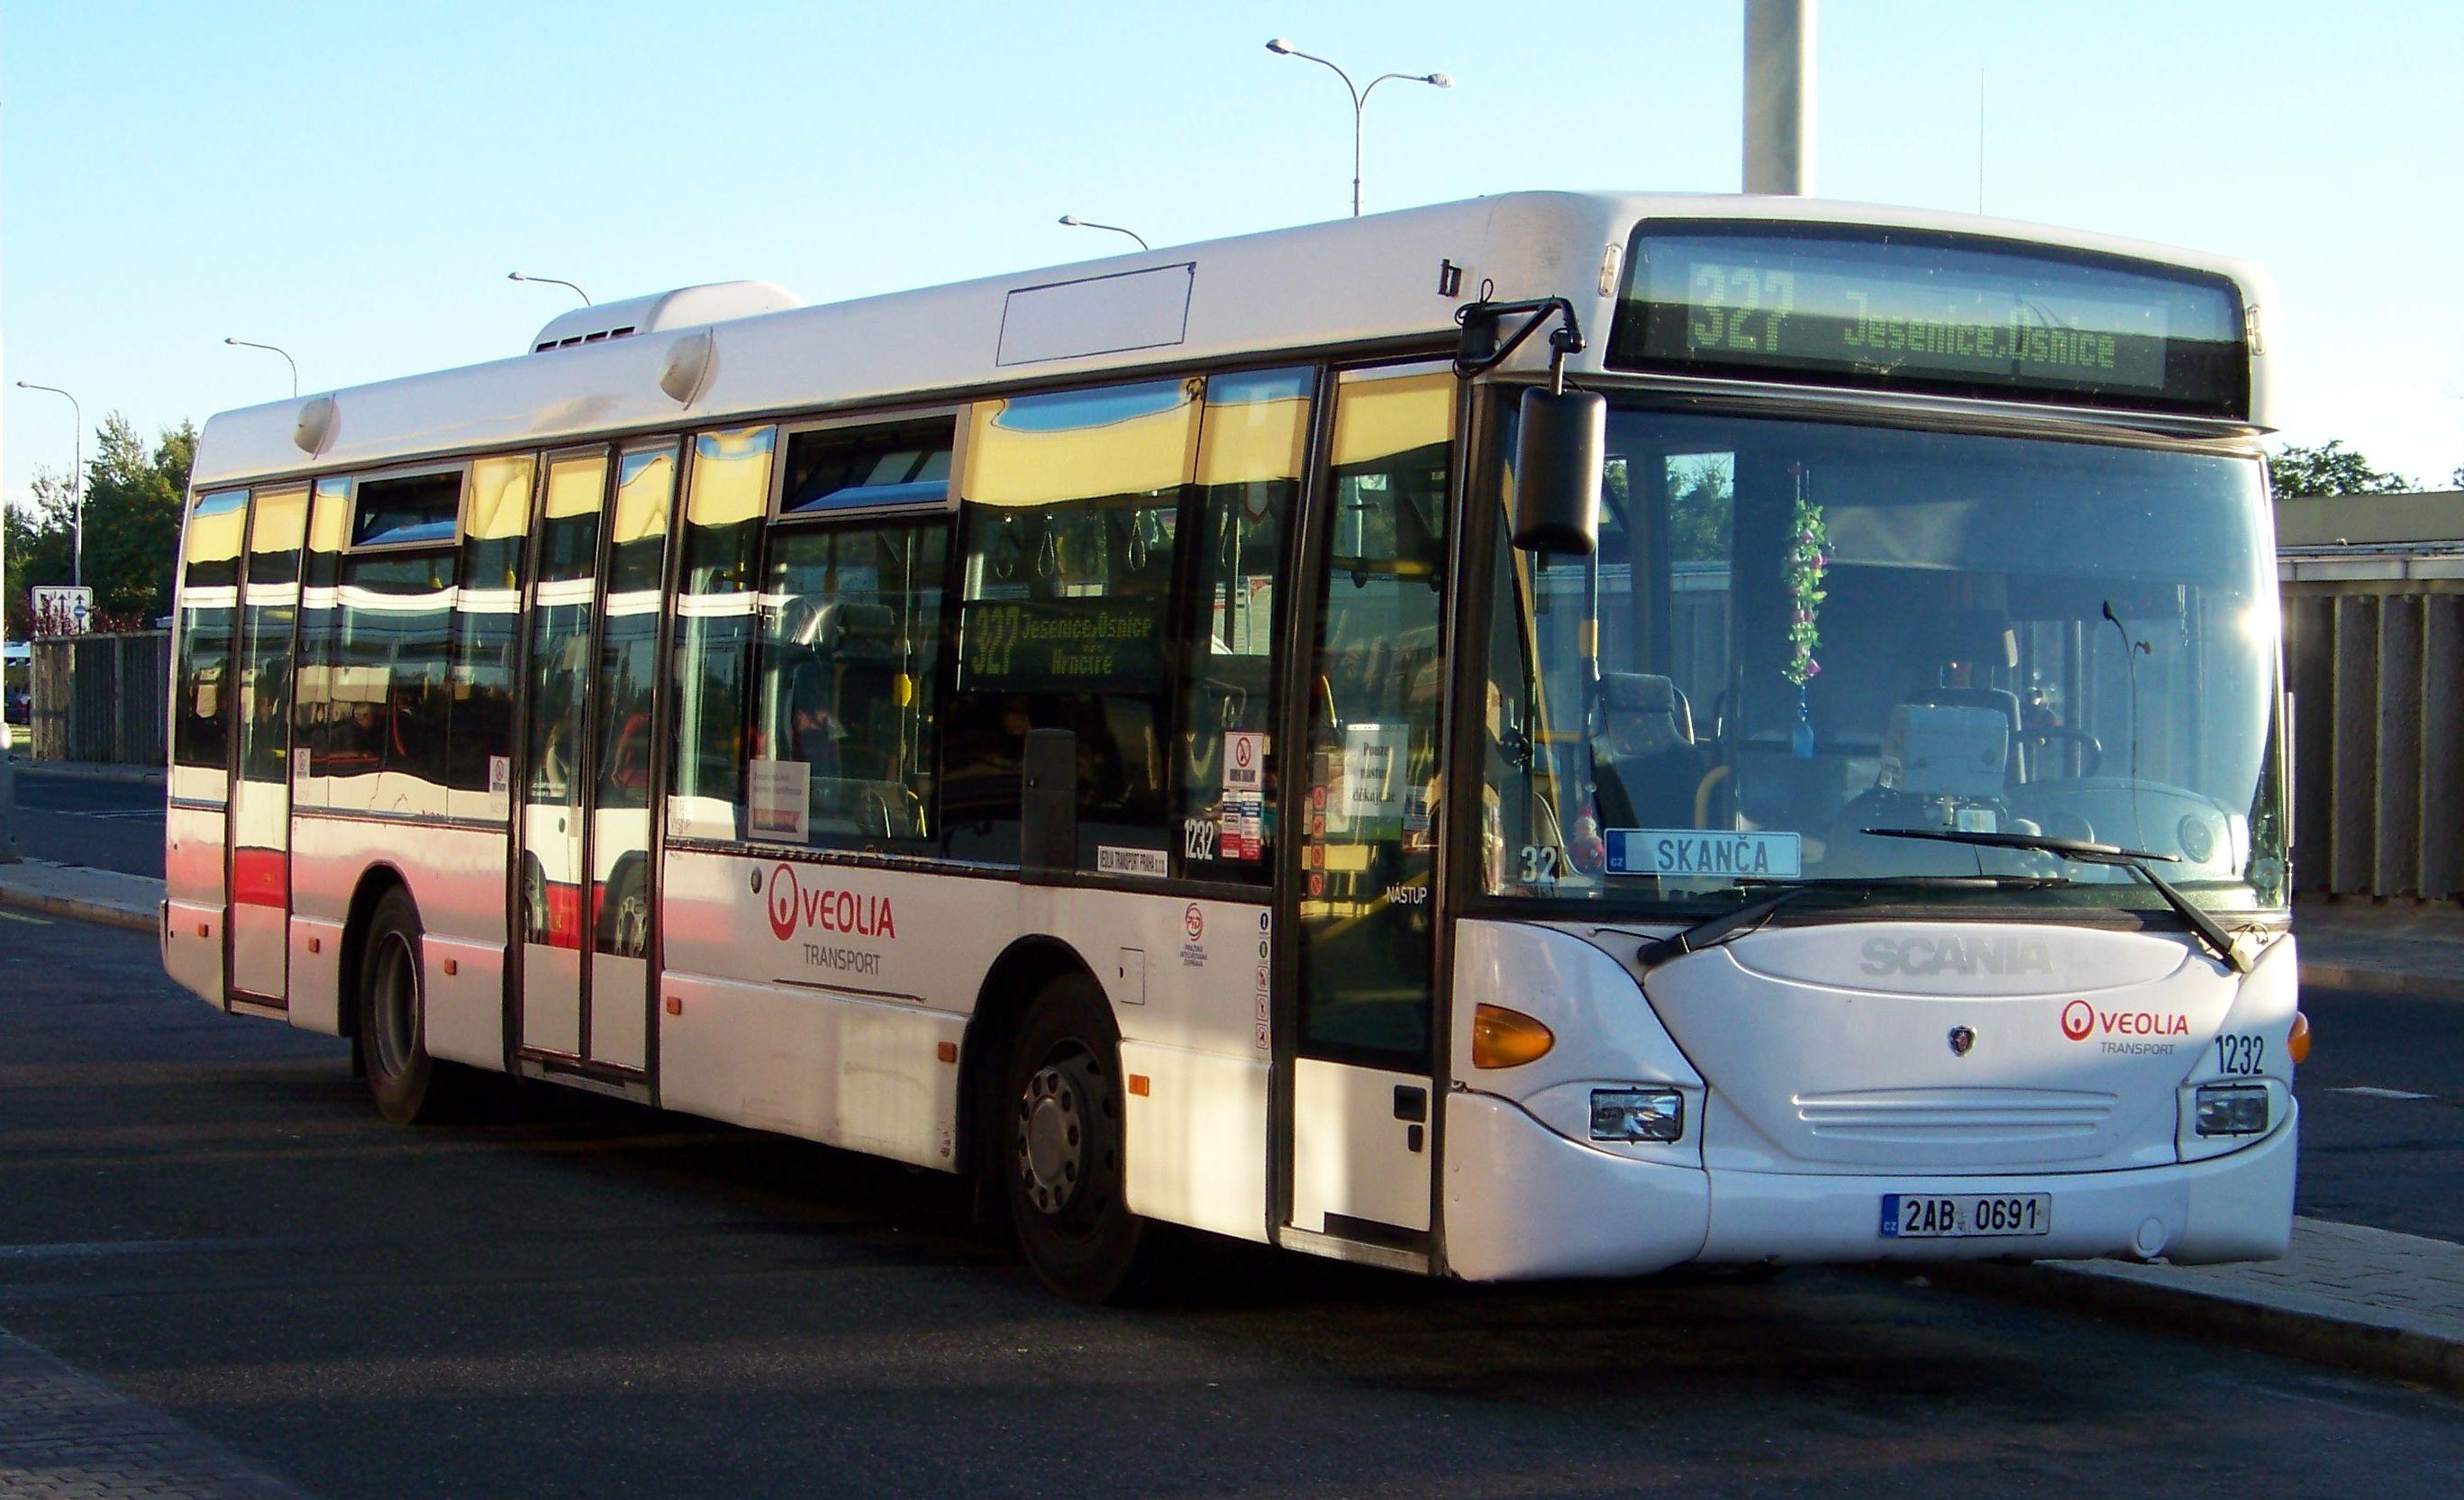 File:Opatov Scania 1232 Veolia Transport Praha.jpg